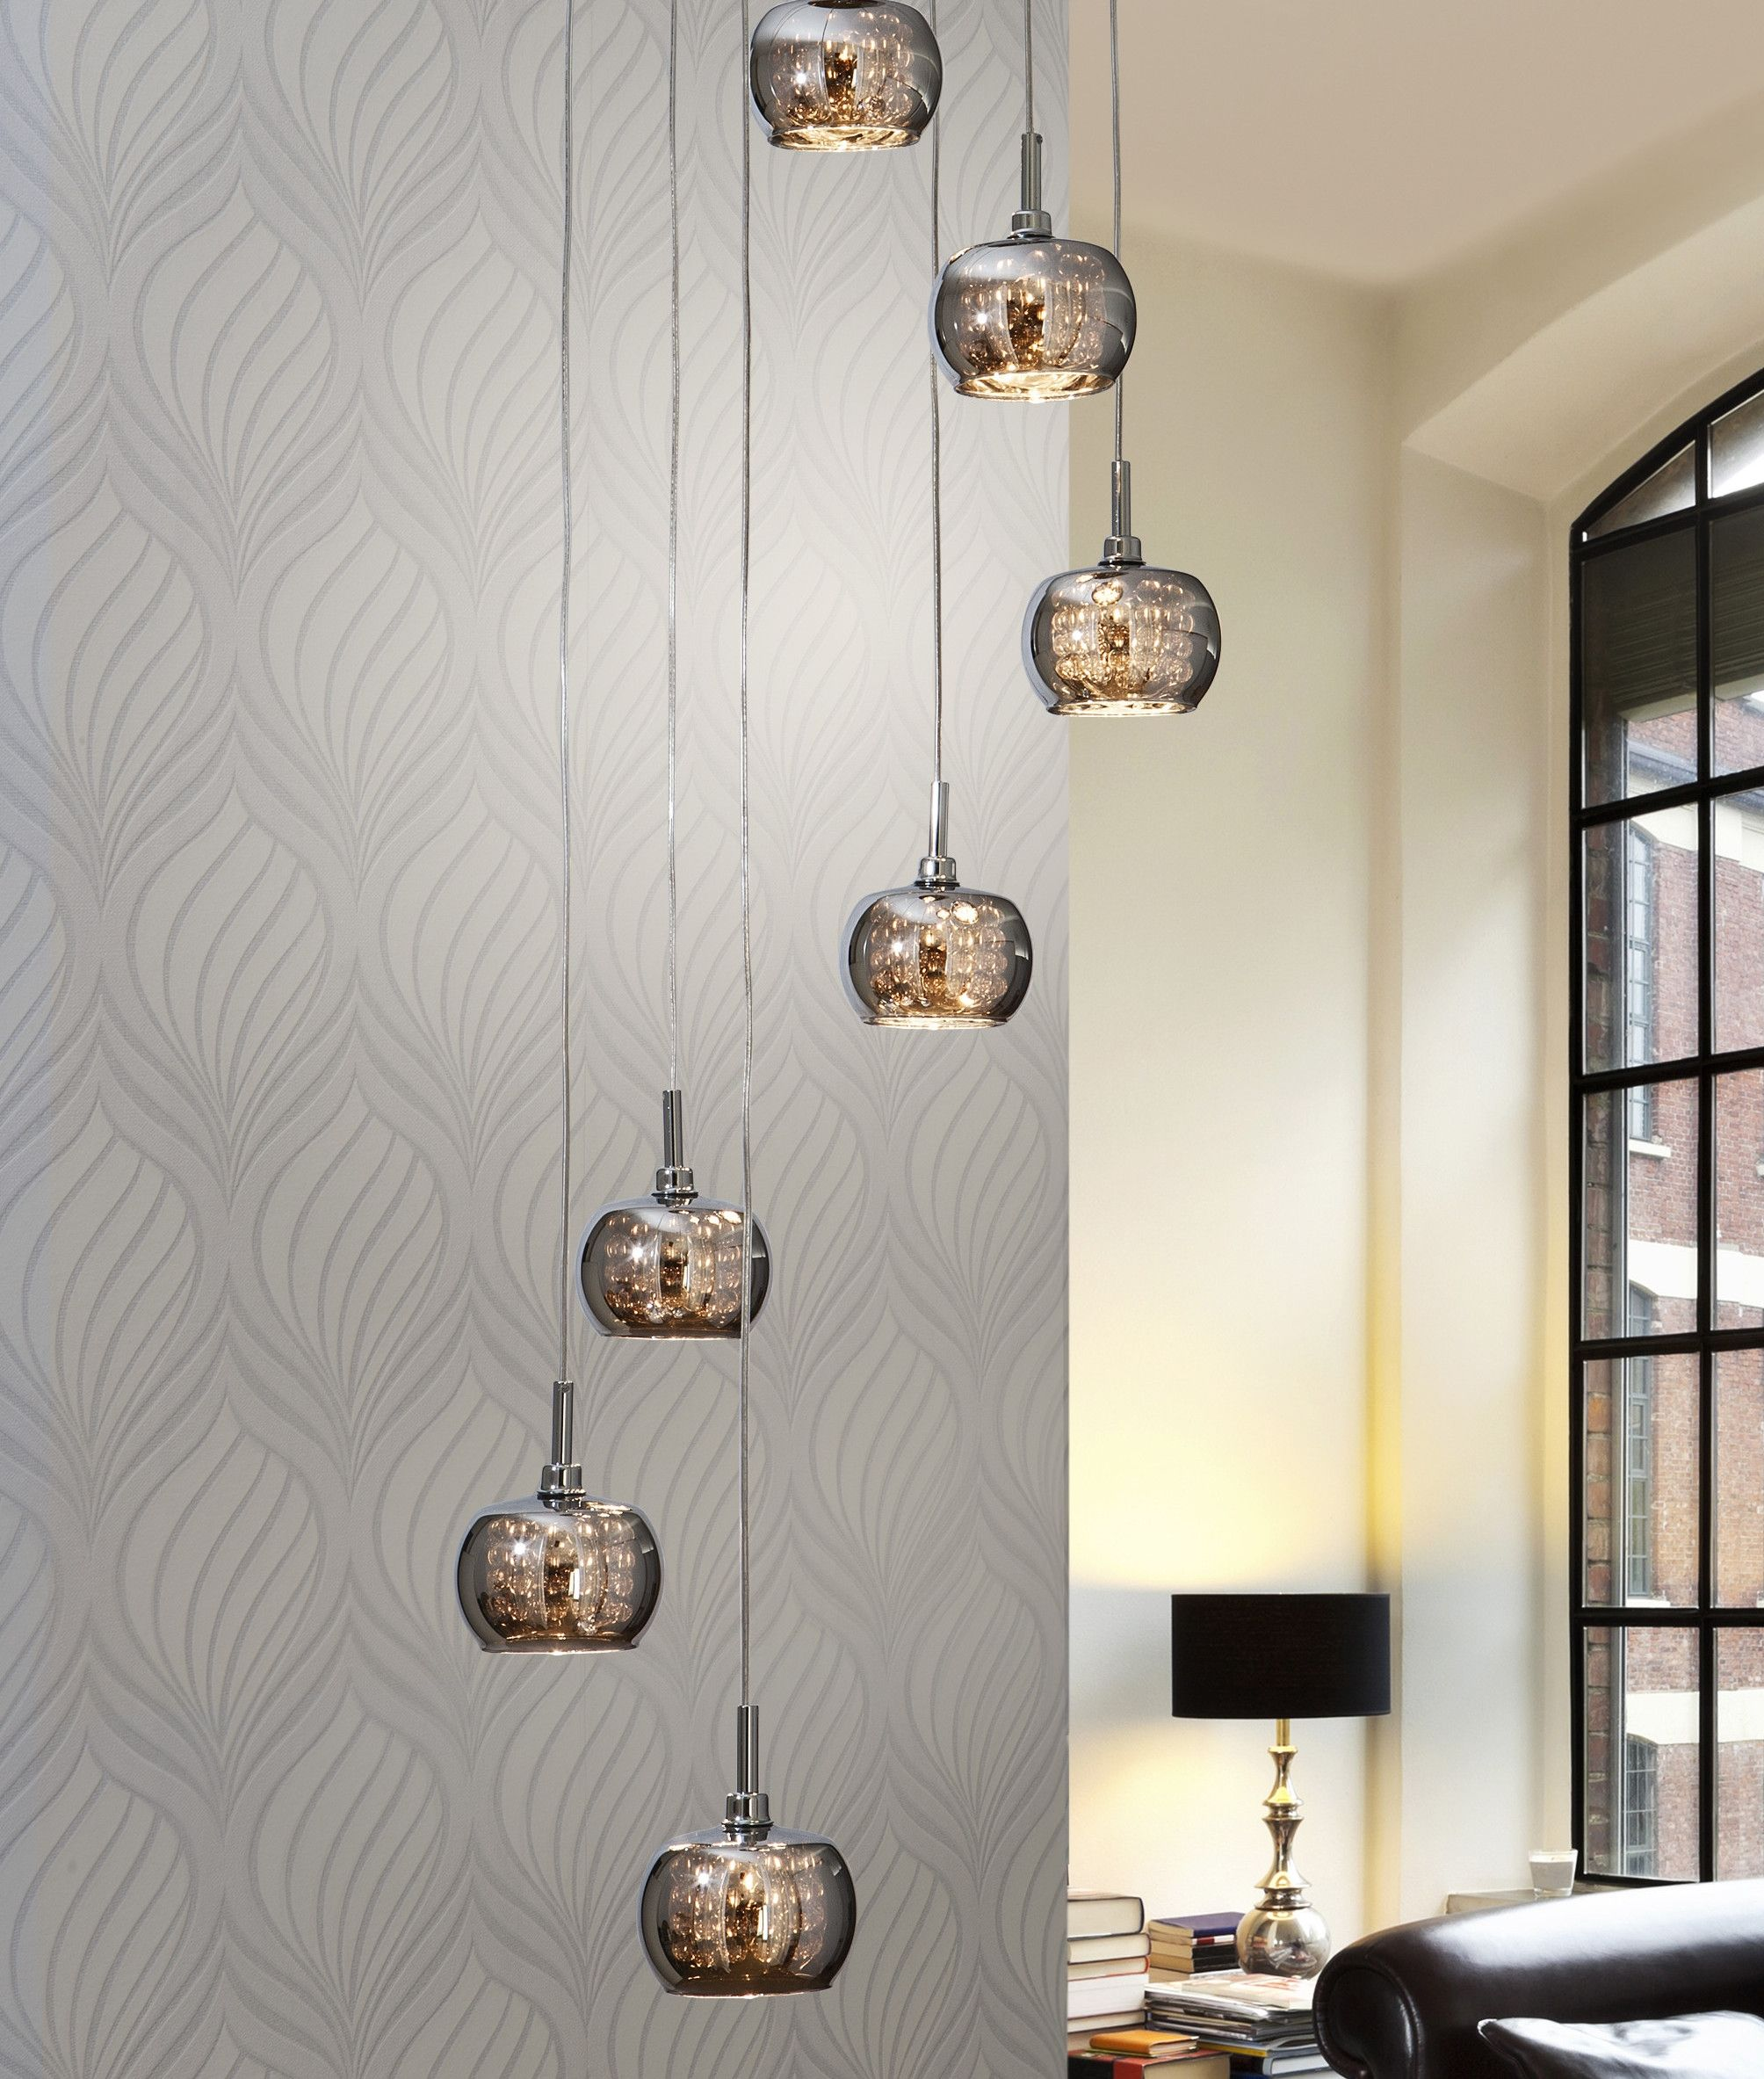 Long Drop LED Pendant Smoked Glass Shades | Lampen